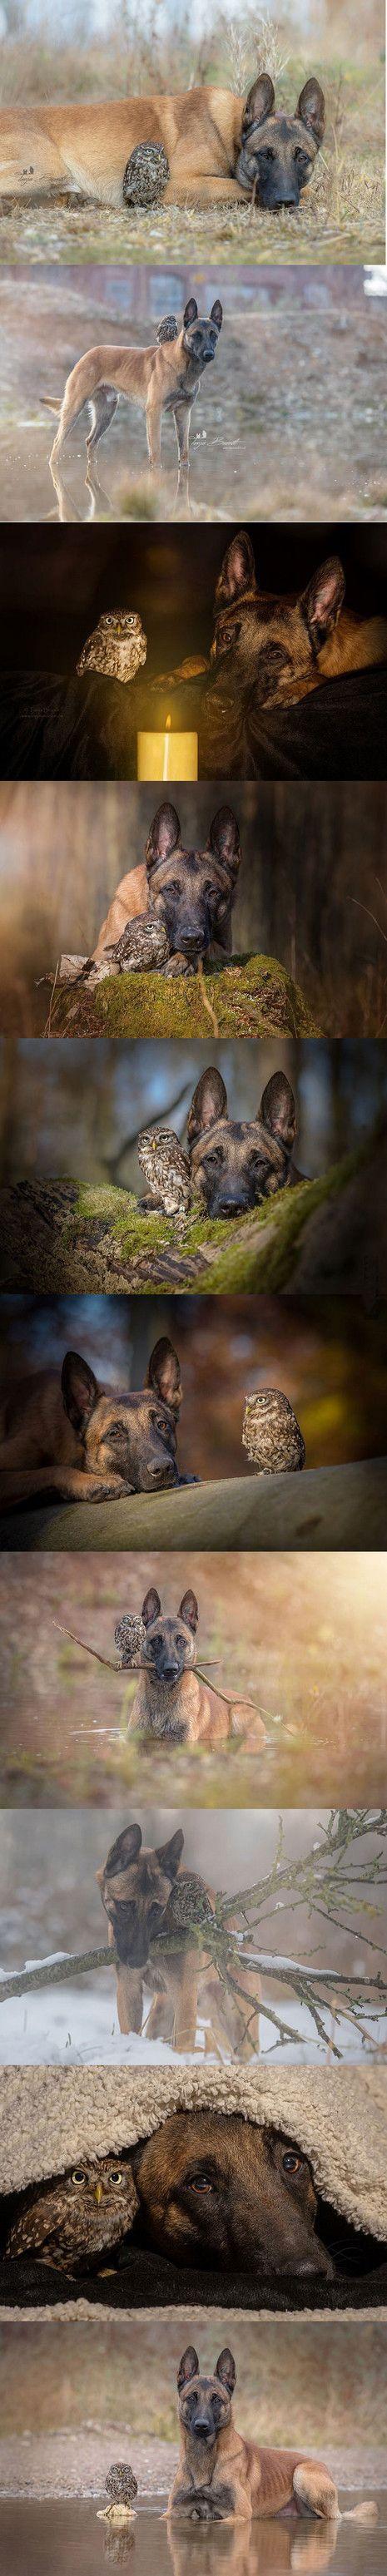 Unlikely animal friends!